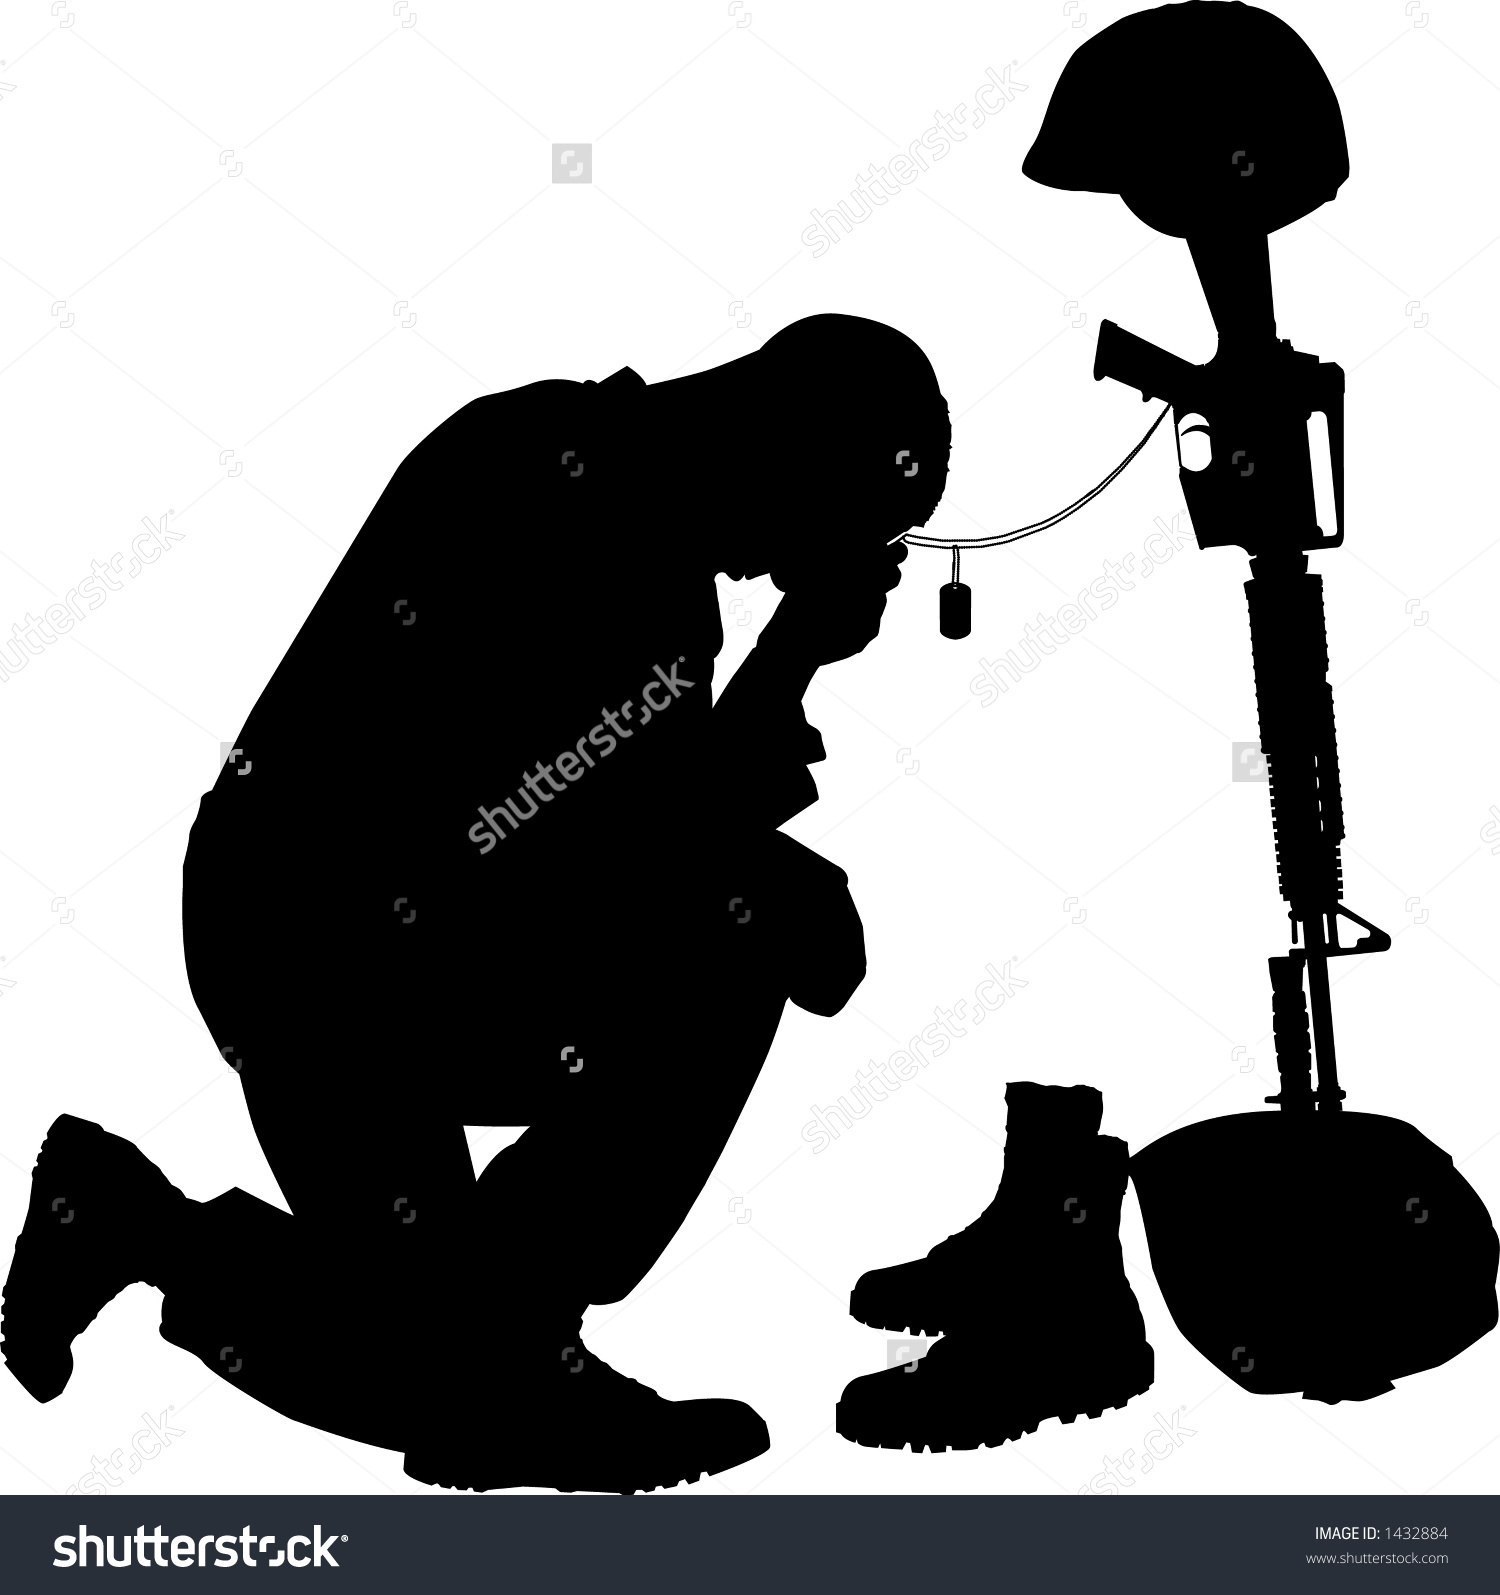 1500x1595 Fallen Soldier Silhouette Clipart